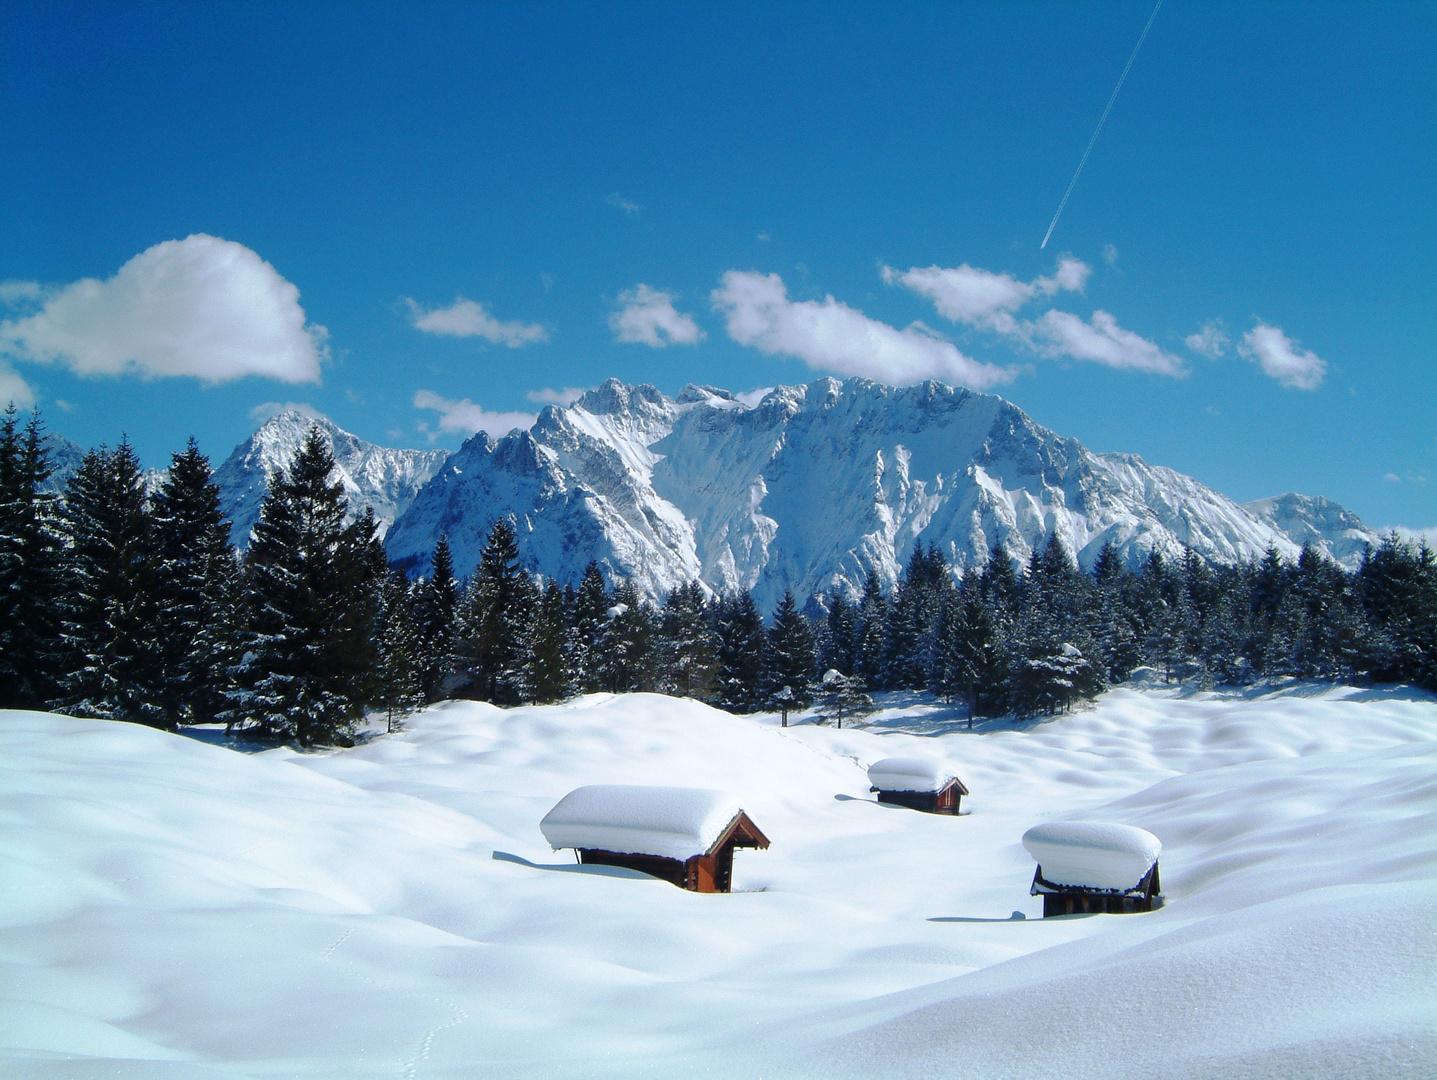 Stille am Karwendel